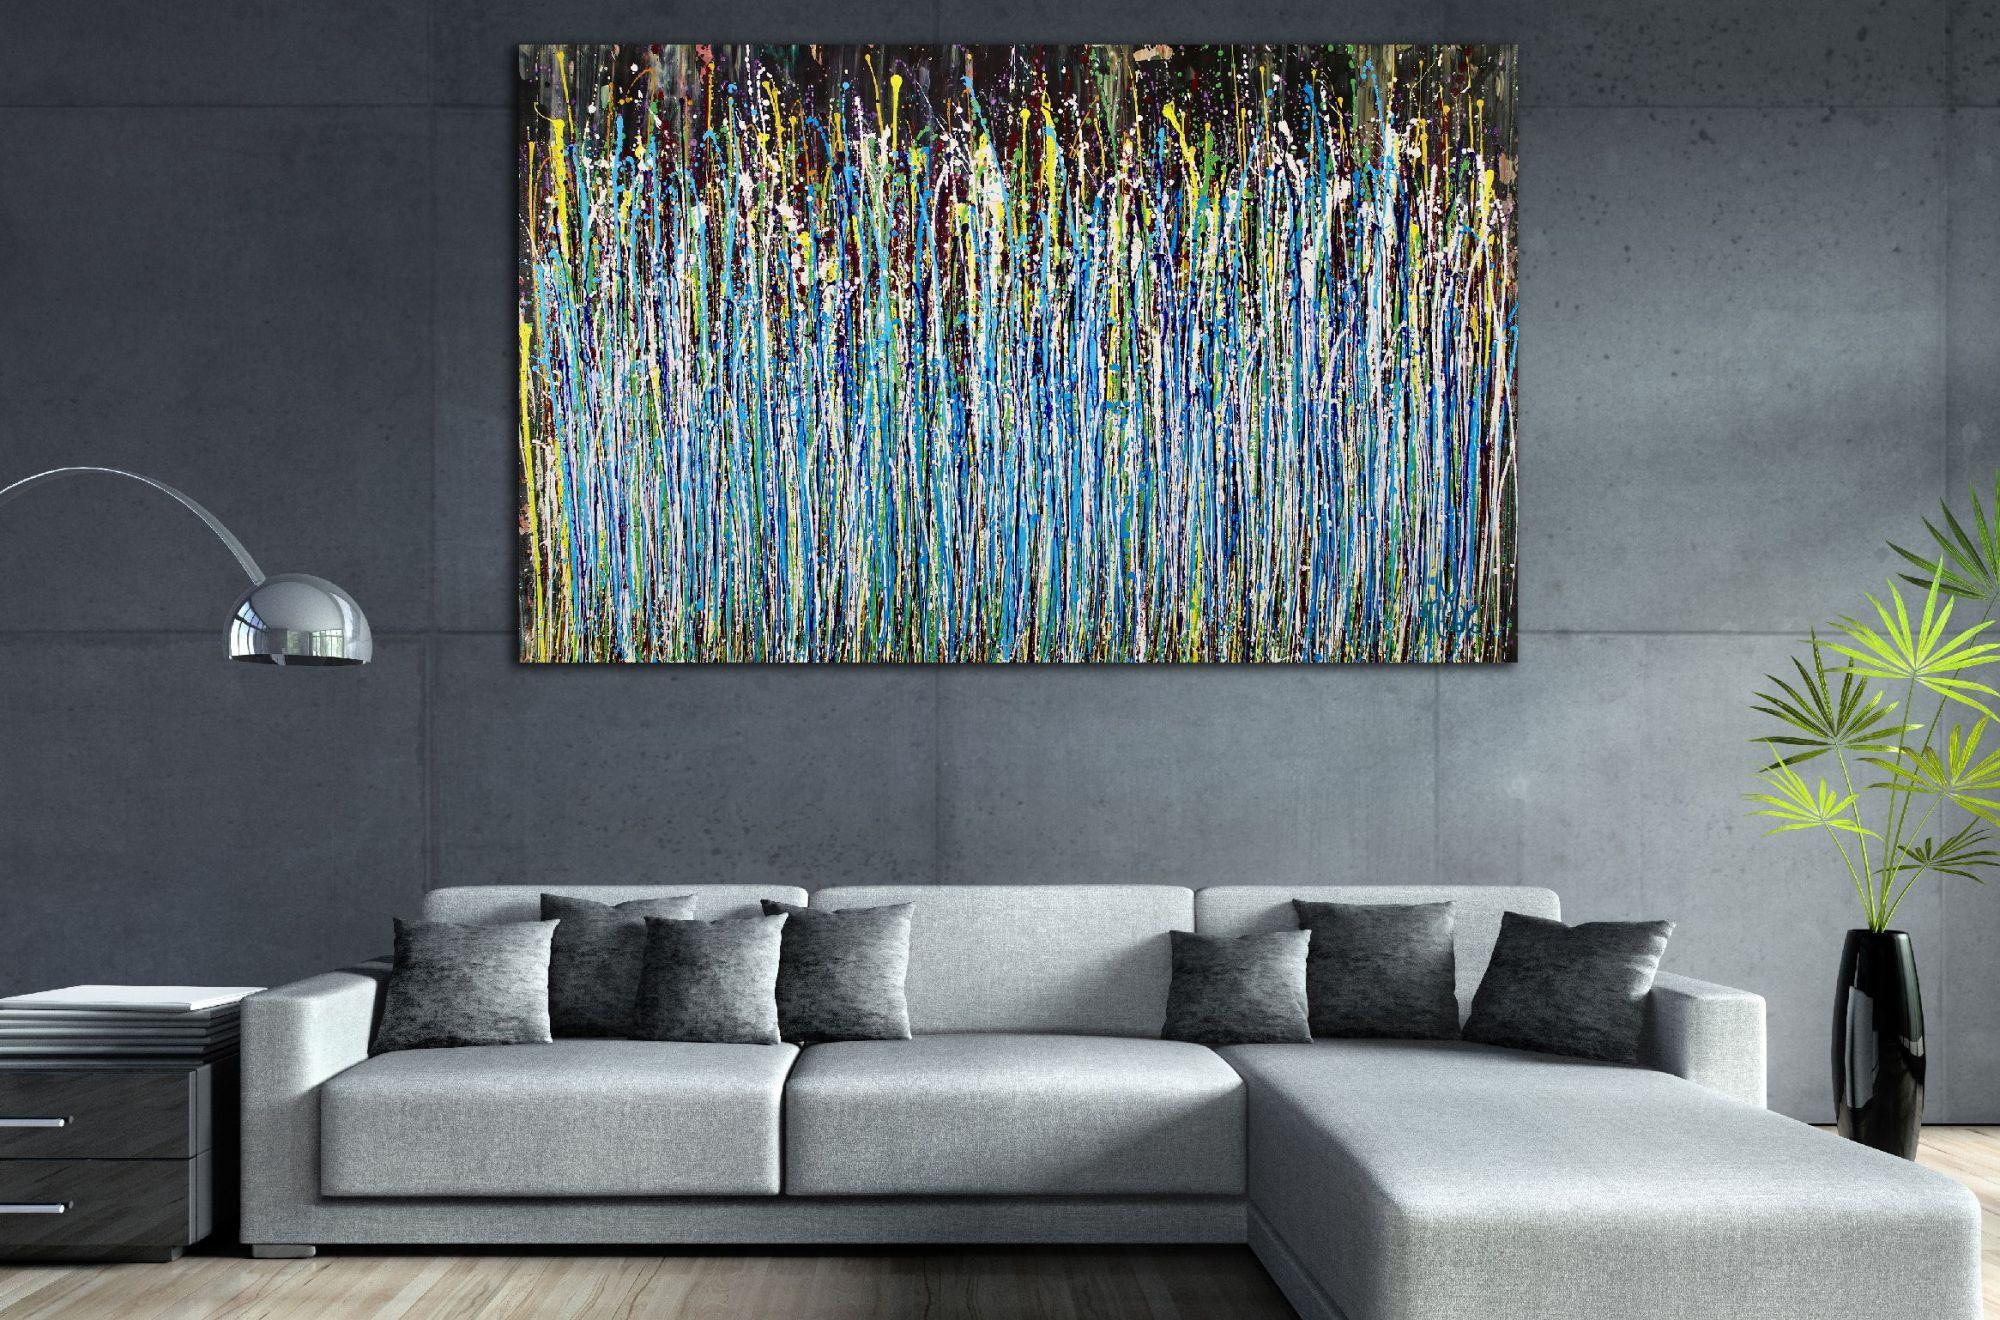 Room View - A Sinful Garden (anochecer) by Nestor Toro